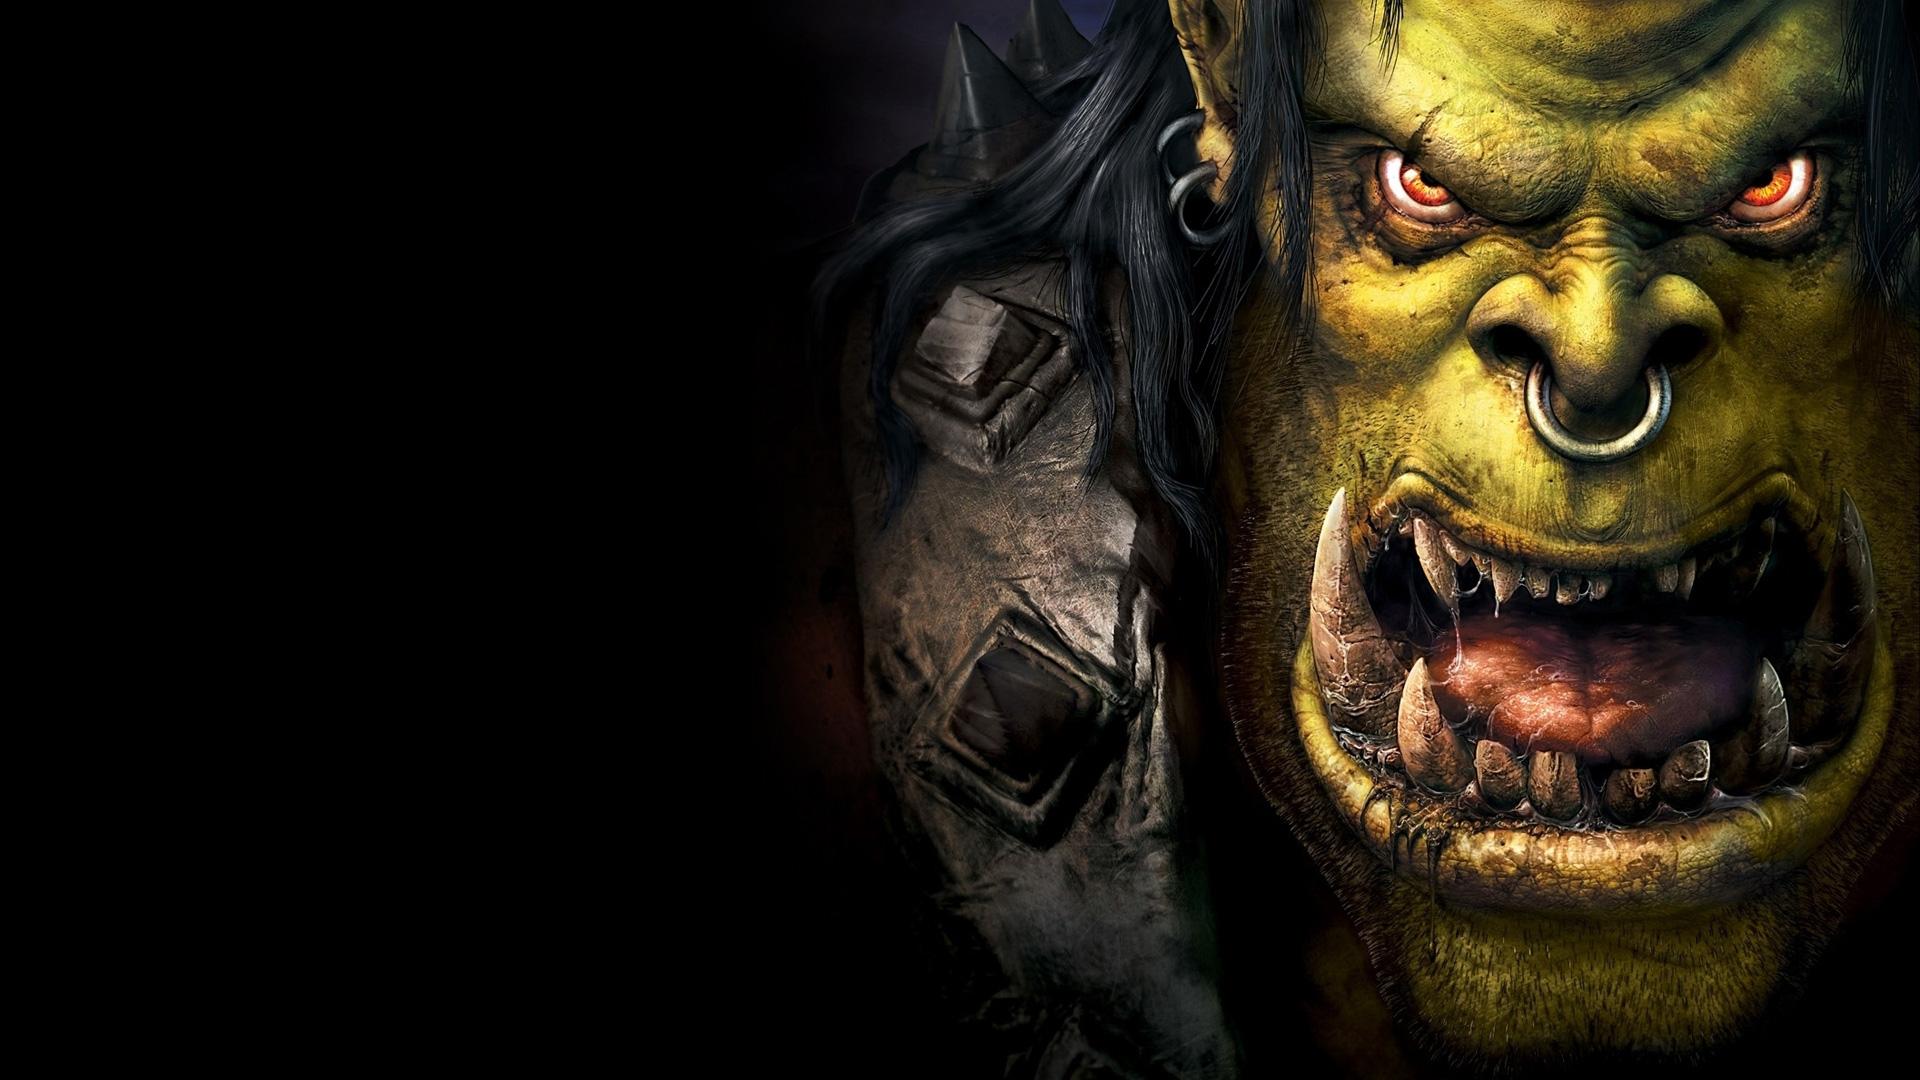 Warcraft 3 wallpaper 1